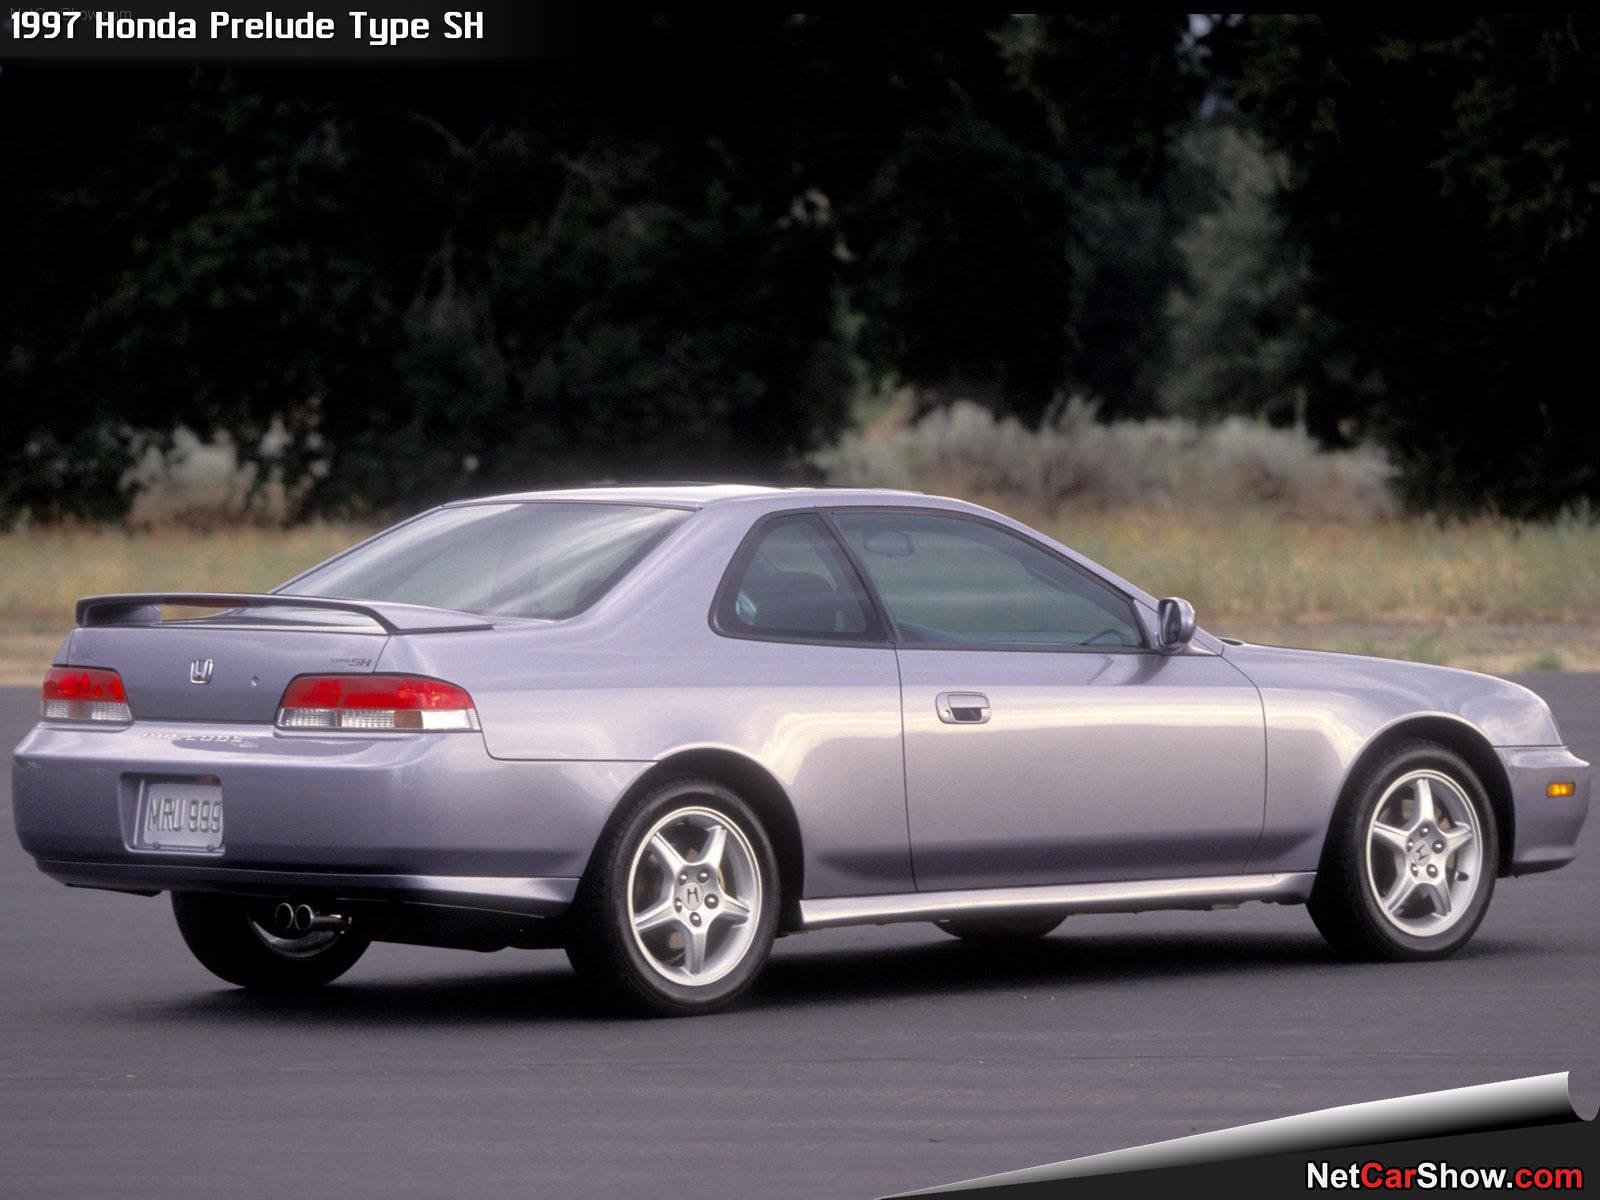 2015 Honda Prelude - Price, Engine, Specs, Release date